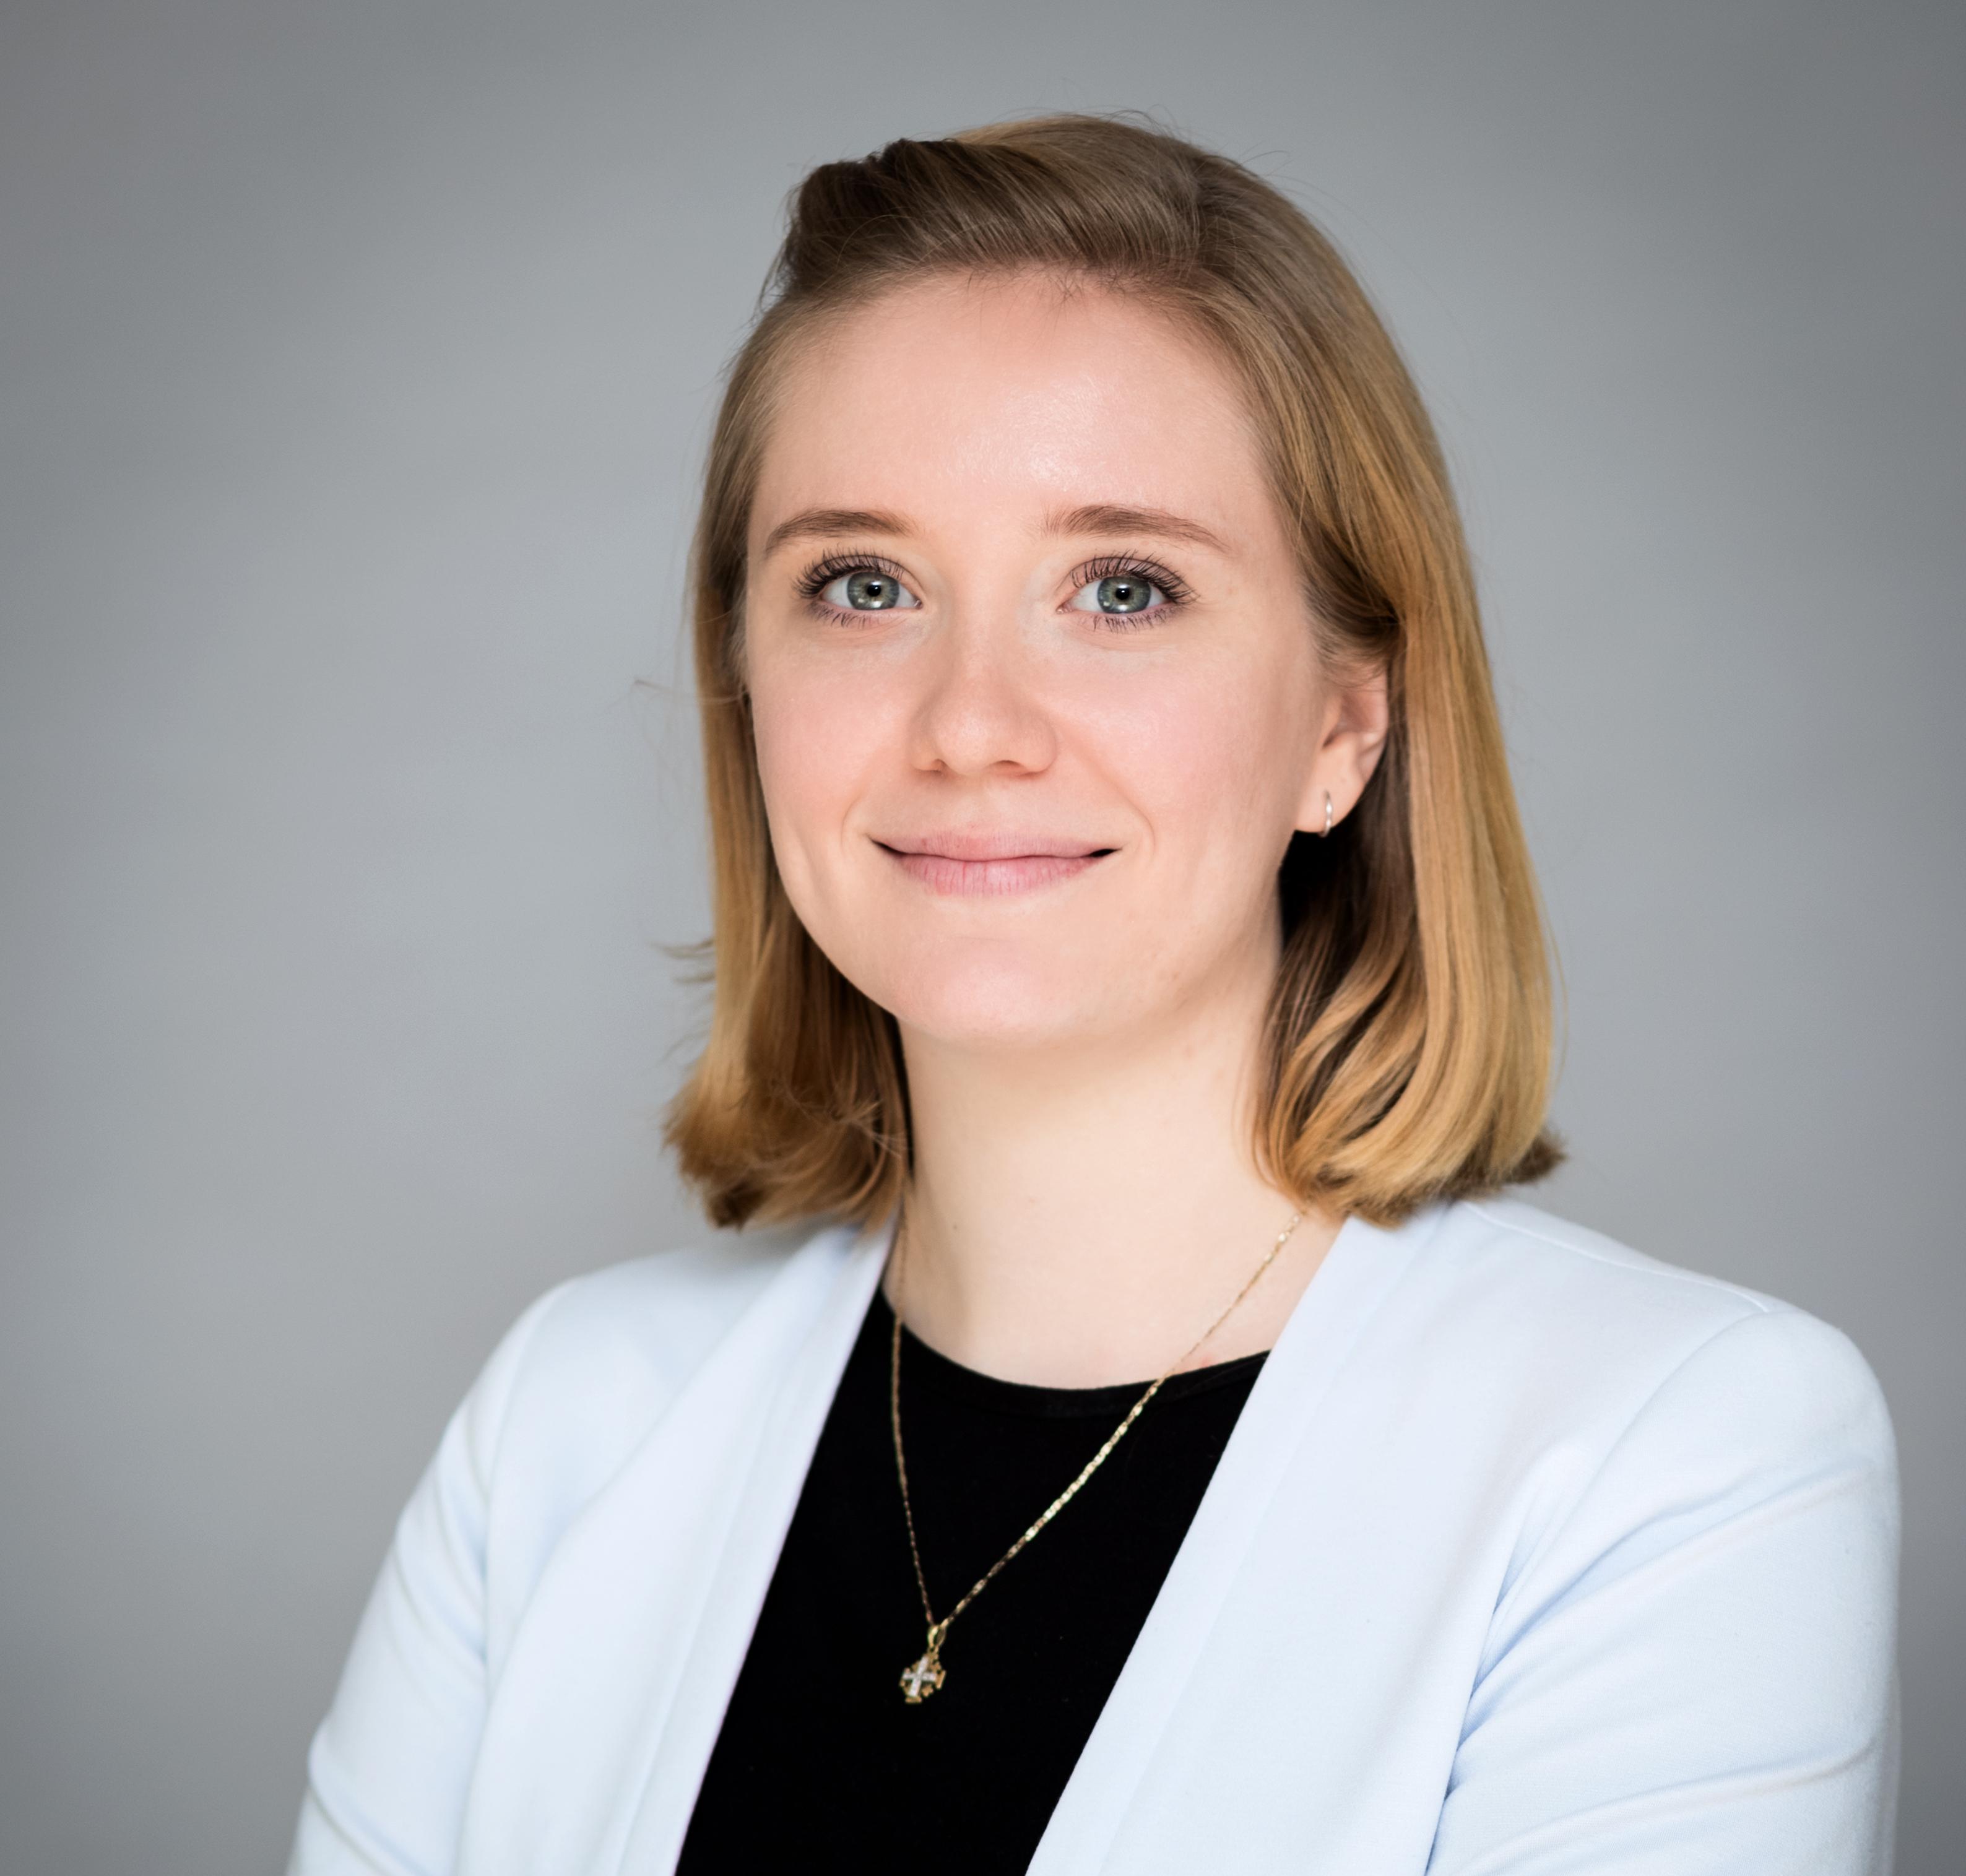 Christine Müller, BLG (1)